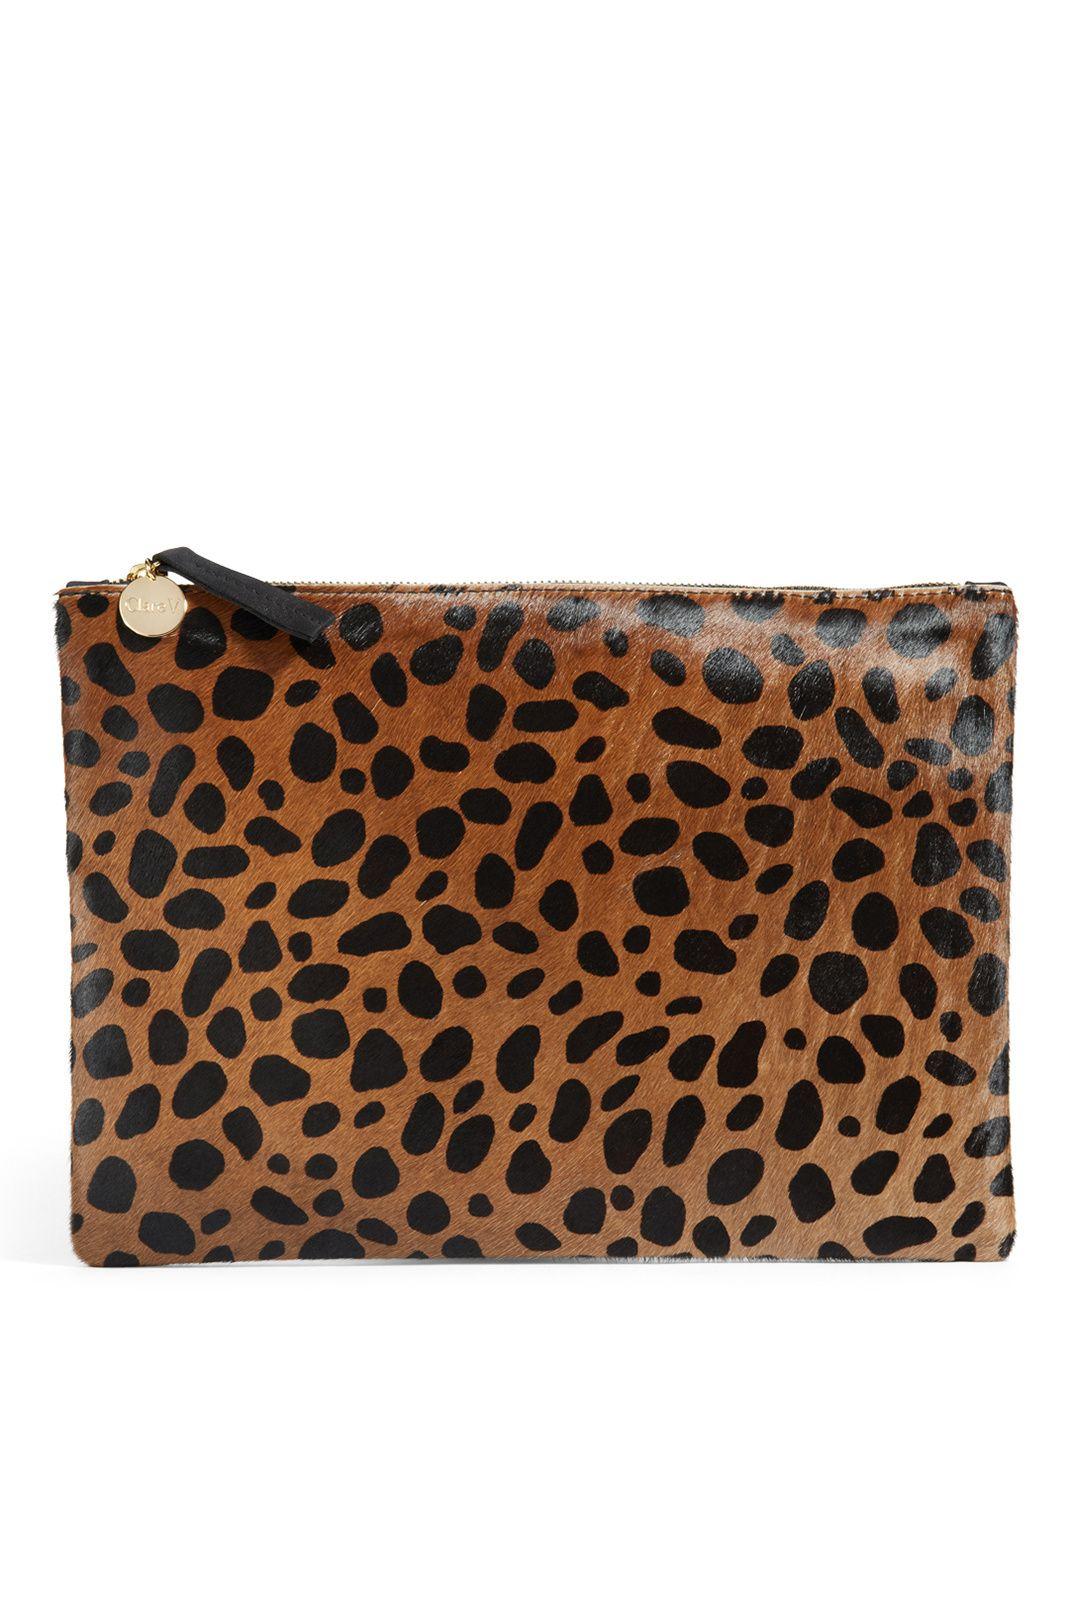 Nicole Miller Cheetah Print Purse /& wallet//clutch